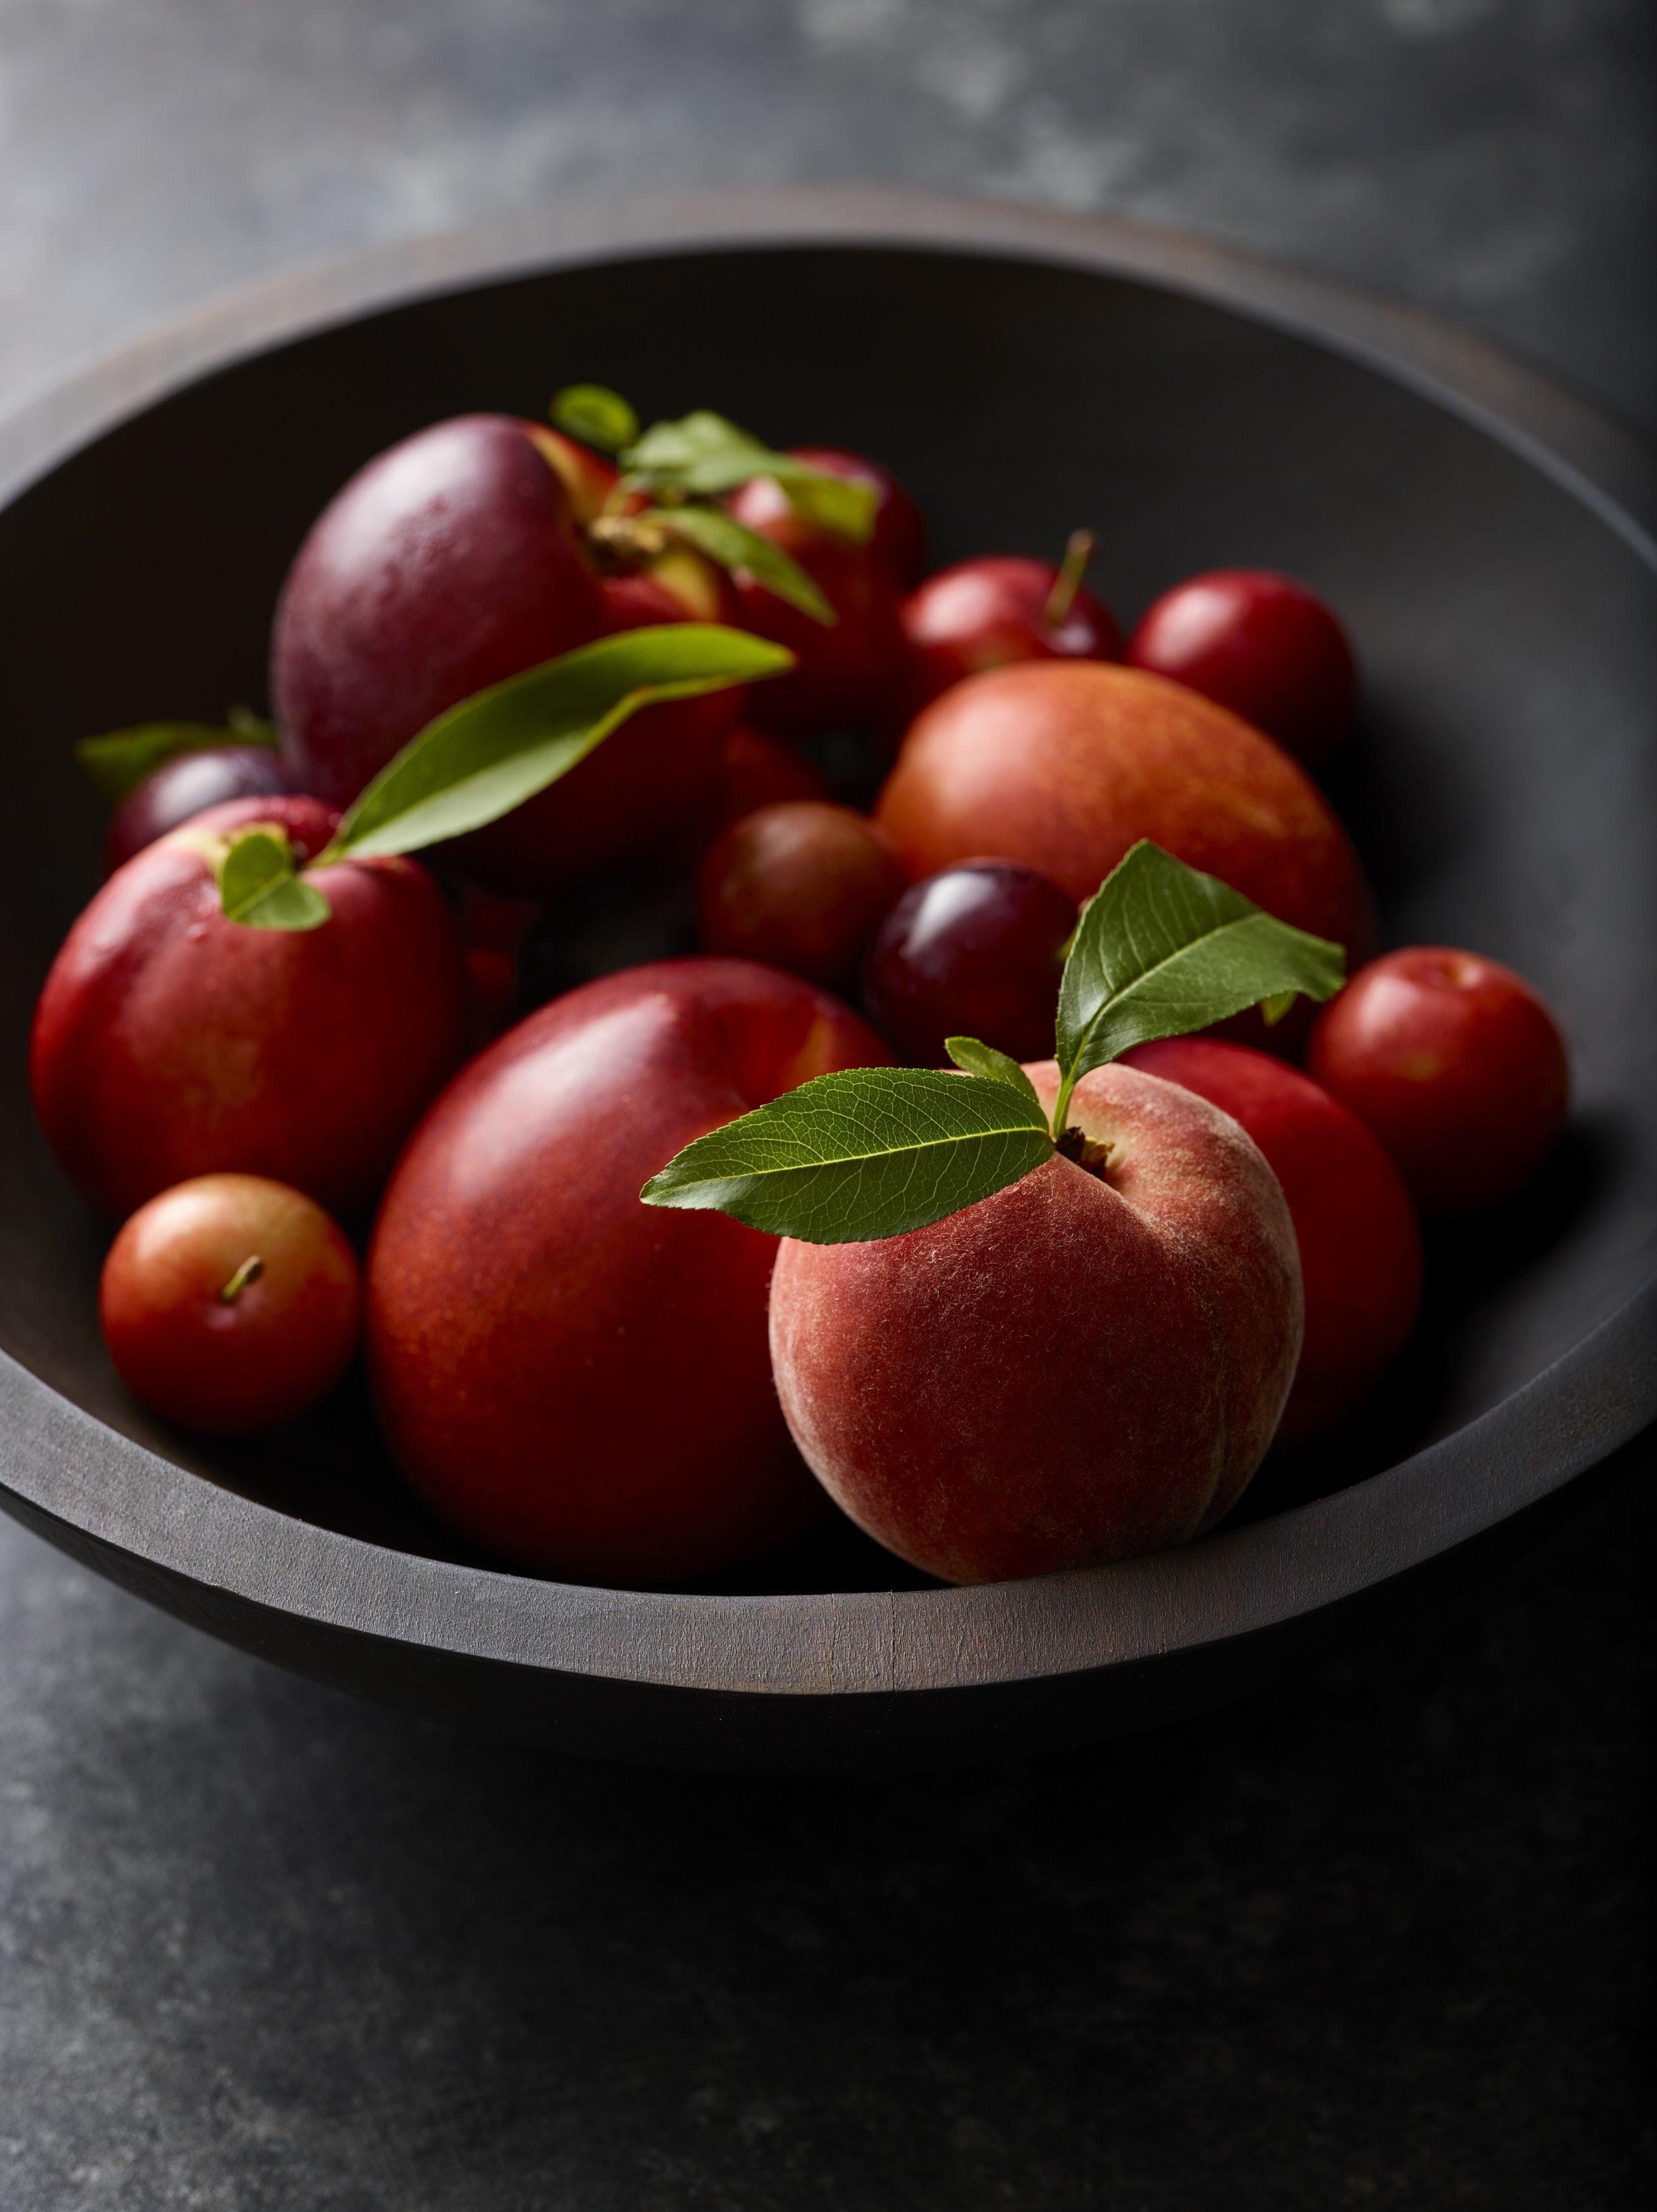 Test_FeliciaPerretti_Fruit.jpg